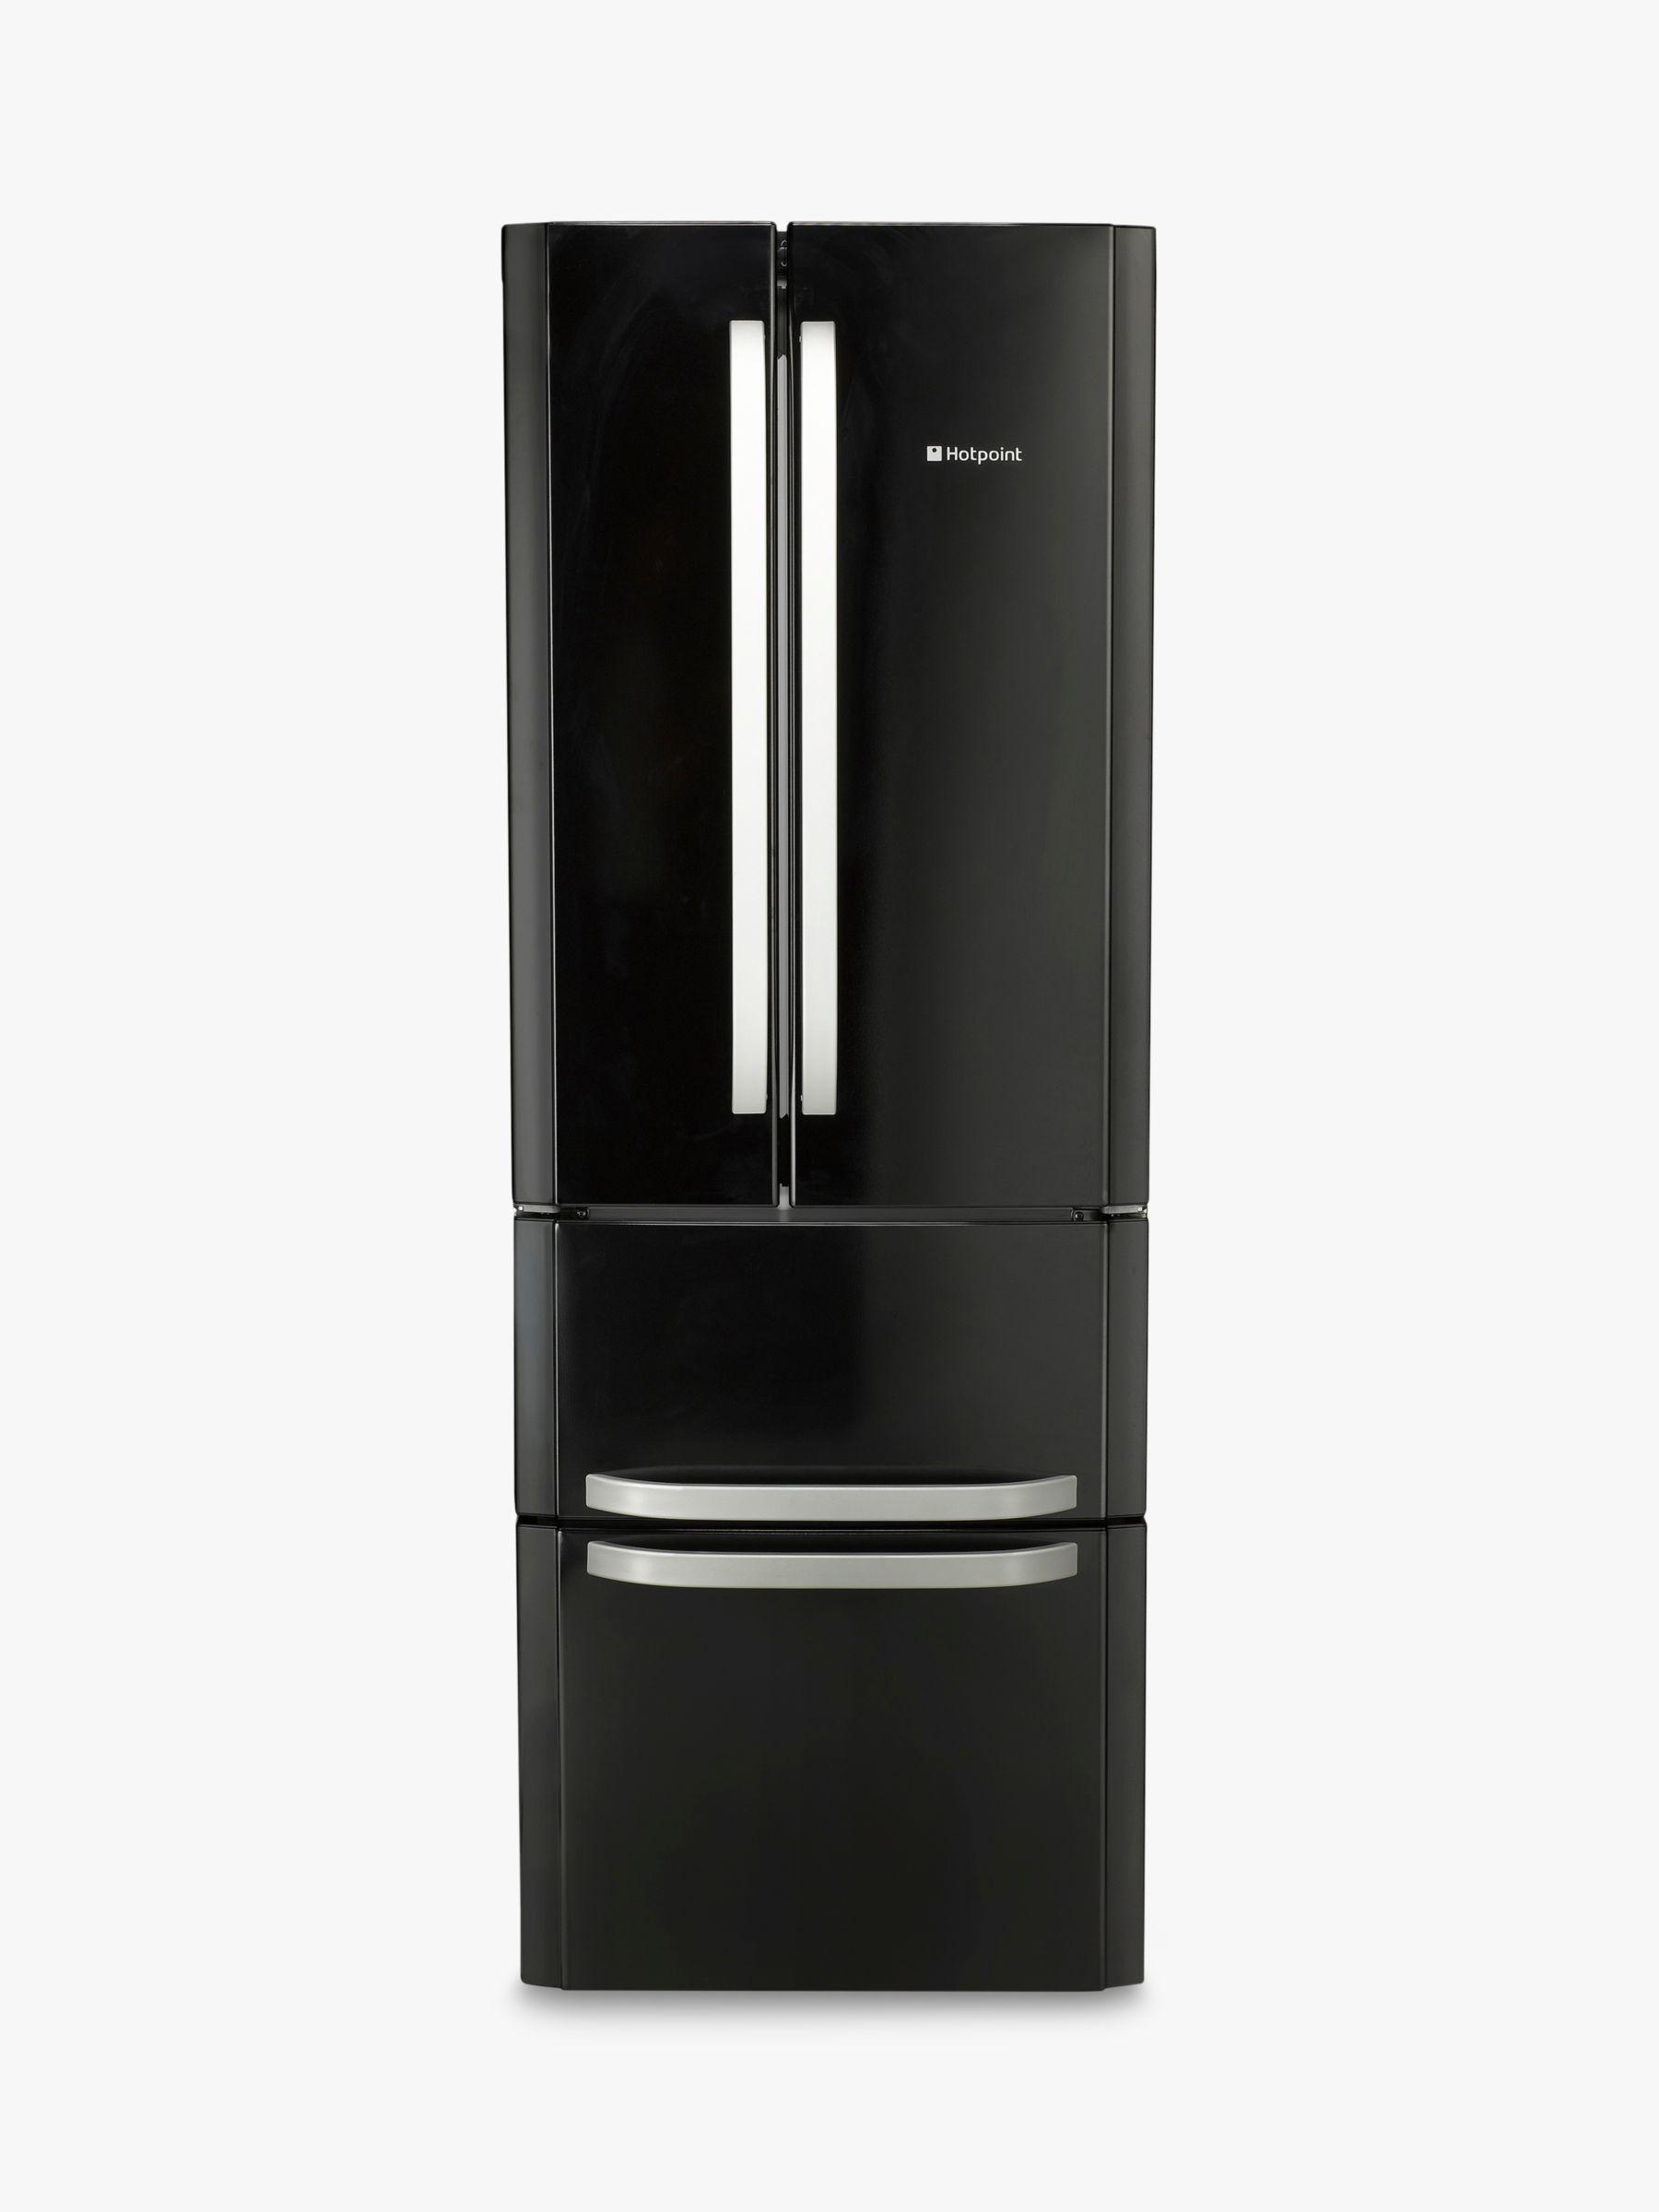 Hotpoint Hotpoint FFU4D.1 K American Style Freestanding Fridge Freezer, A+ Energy Rating, 70cm Wide, Black